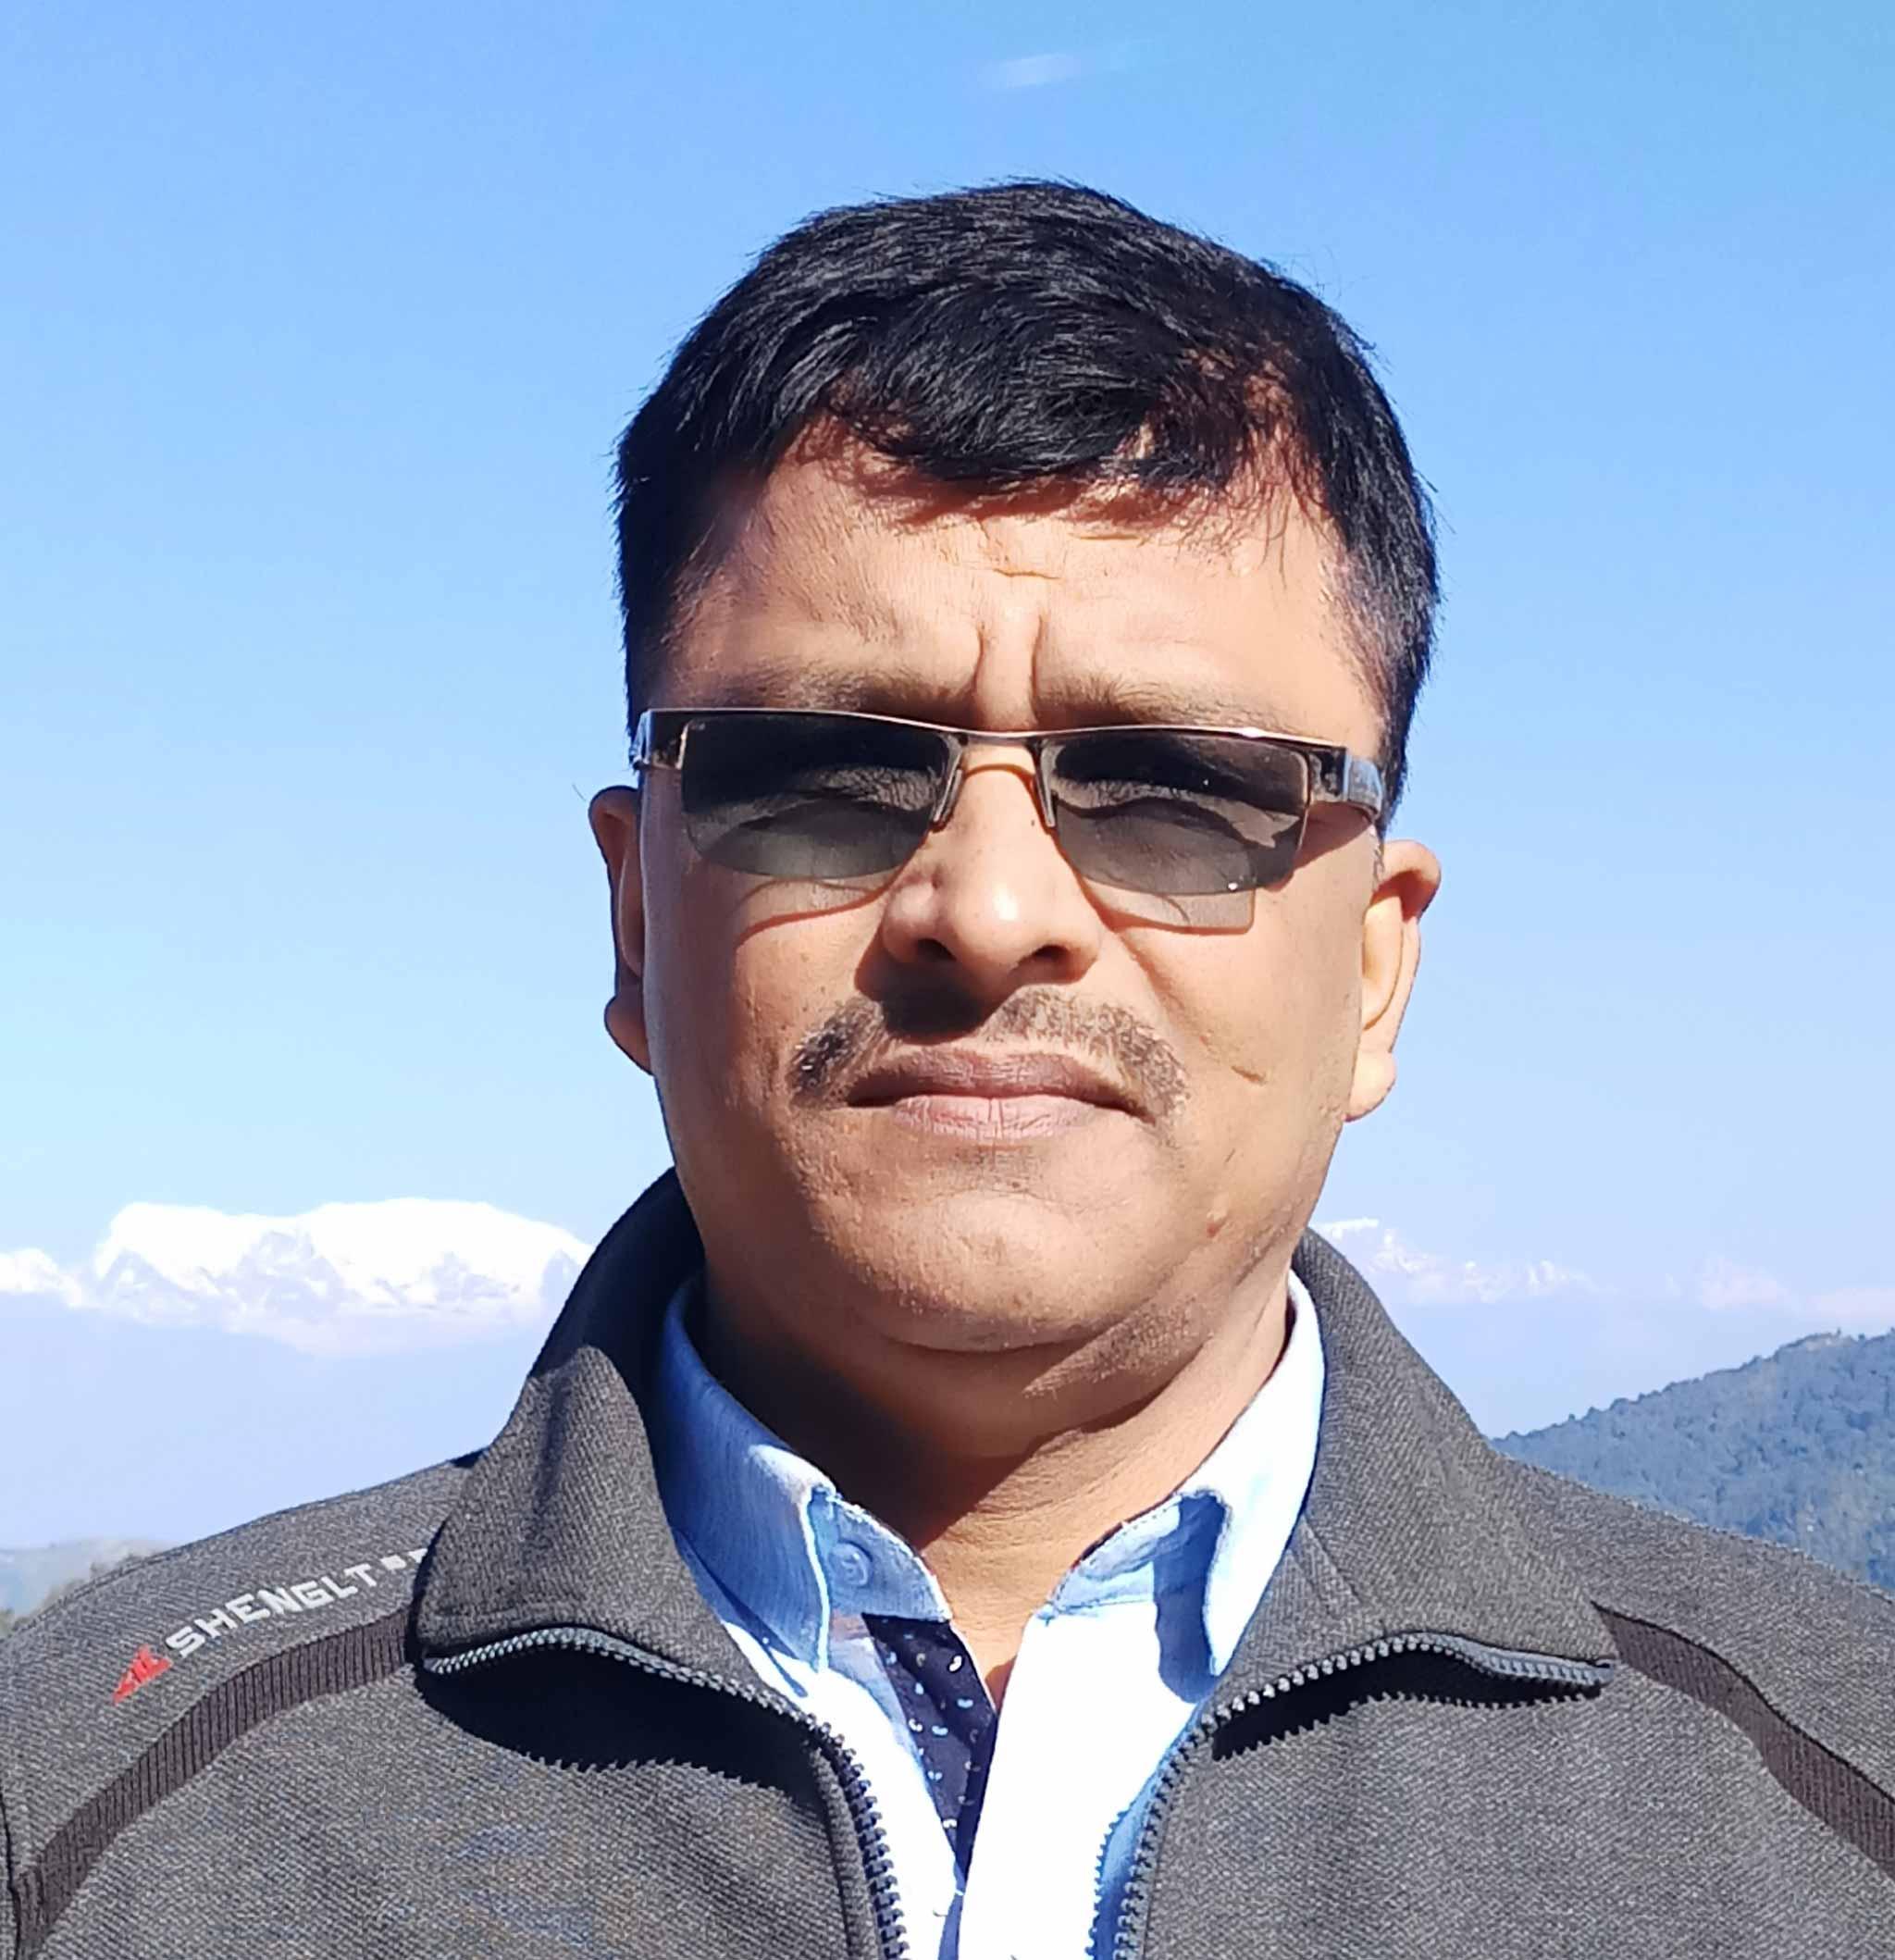 mahendra morang campus Physics (M.Sc.)